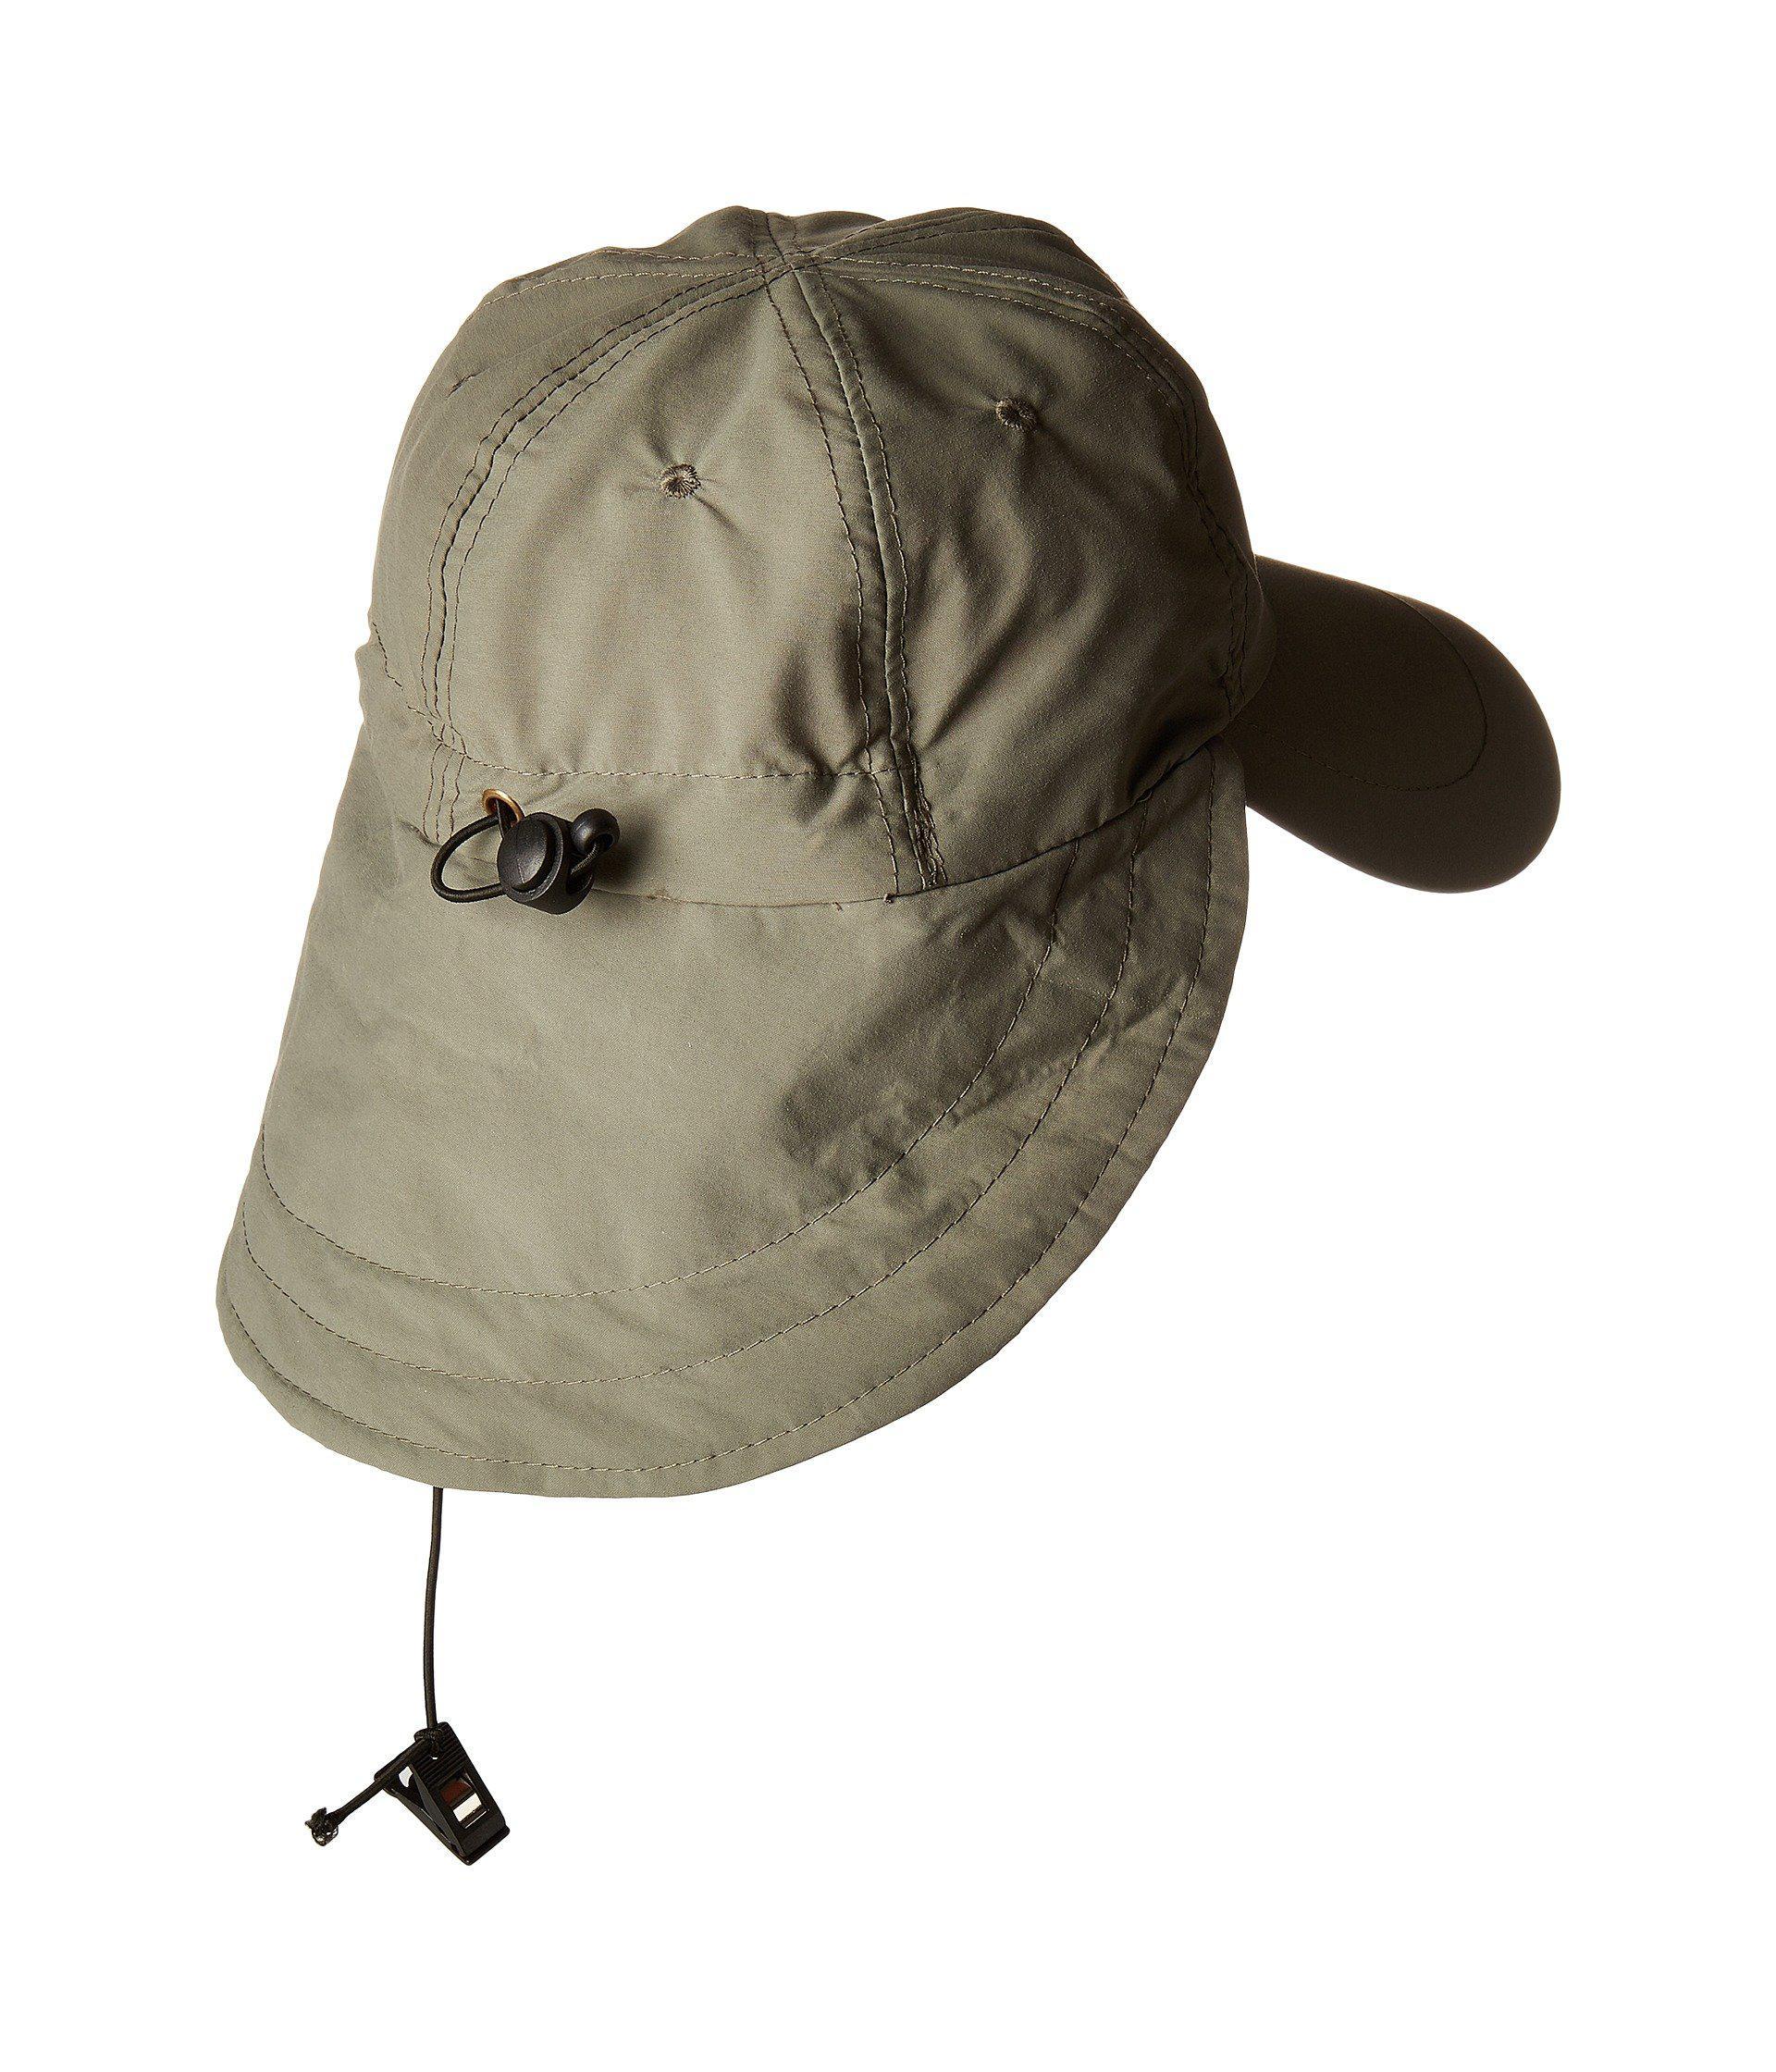 b3611c1d7e2 Stetson - Multicolor No Fly Zone Flap Cap (willow) Caps for Men - Lyst. View  fullscreen